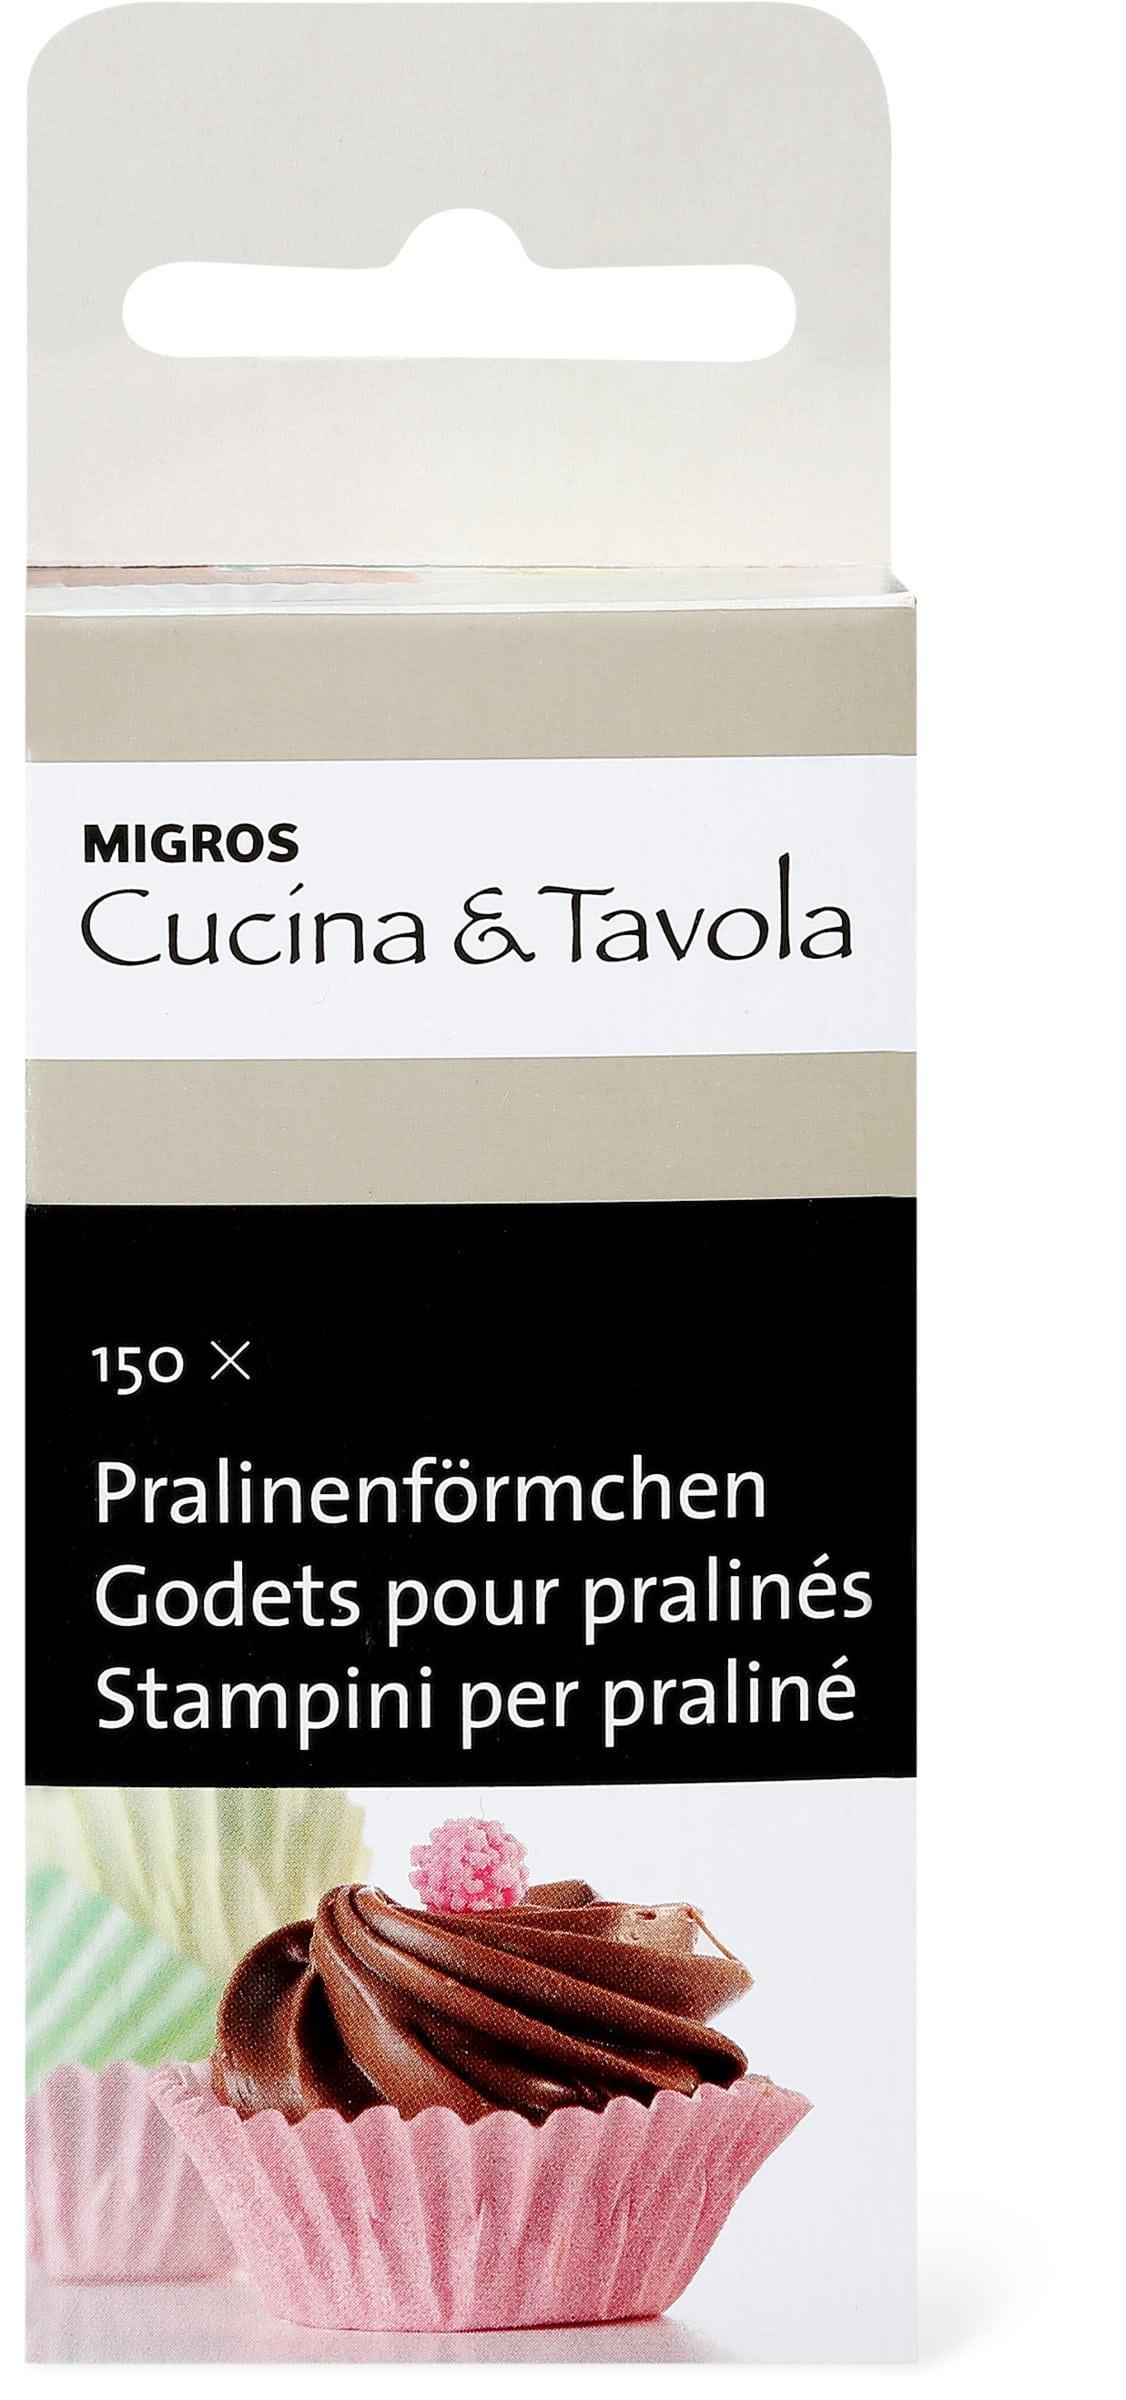 Cucina & Tavola CUCINA & TAVOLA Stampini per praliné